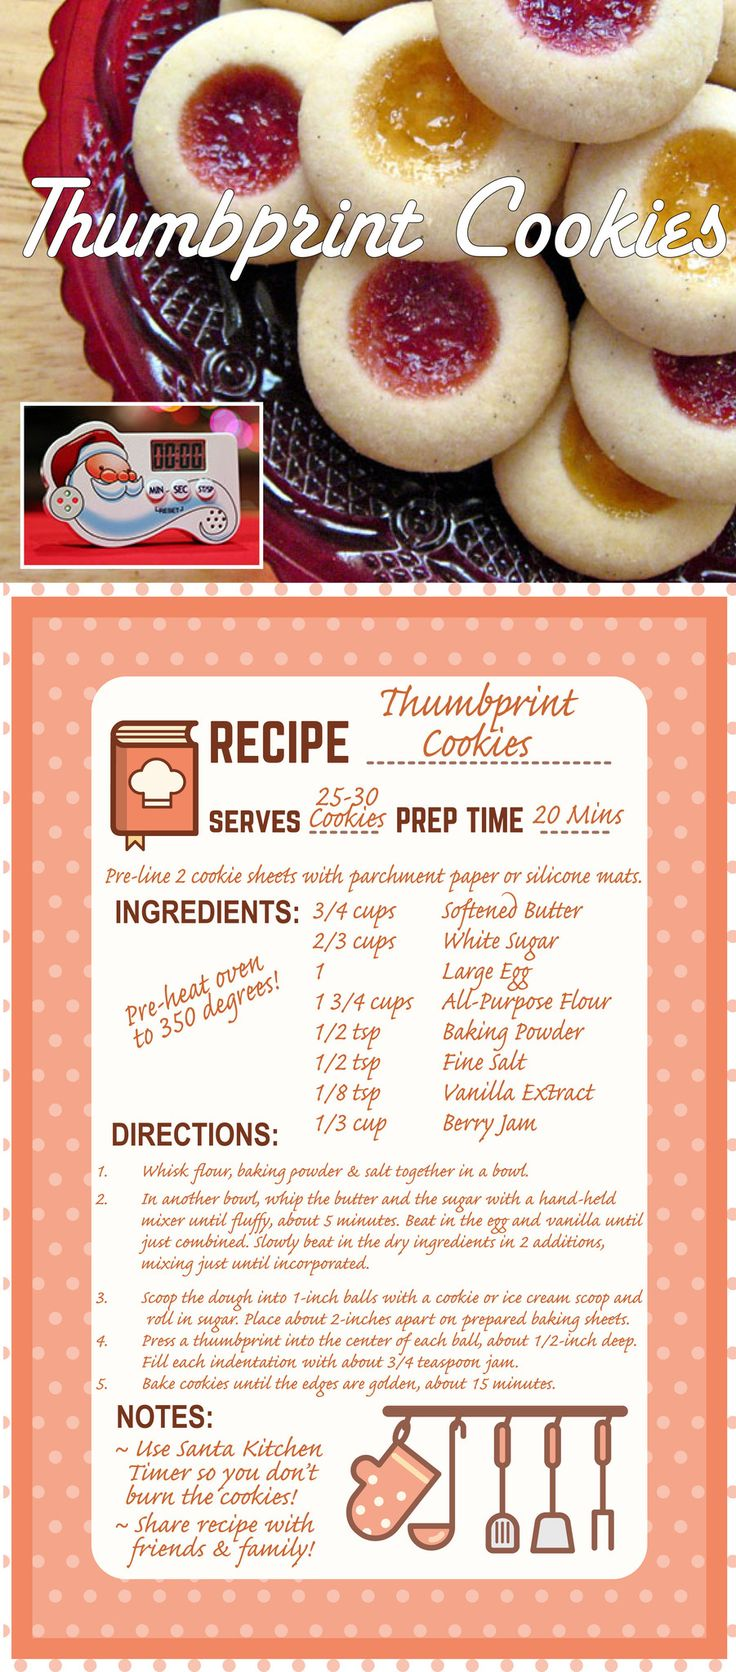 Week 20: Thumbprint Cookies - gevuld met stukjes karamel, stukjes chocola of…